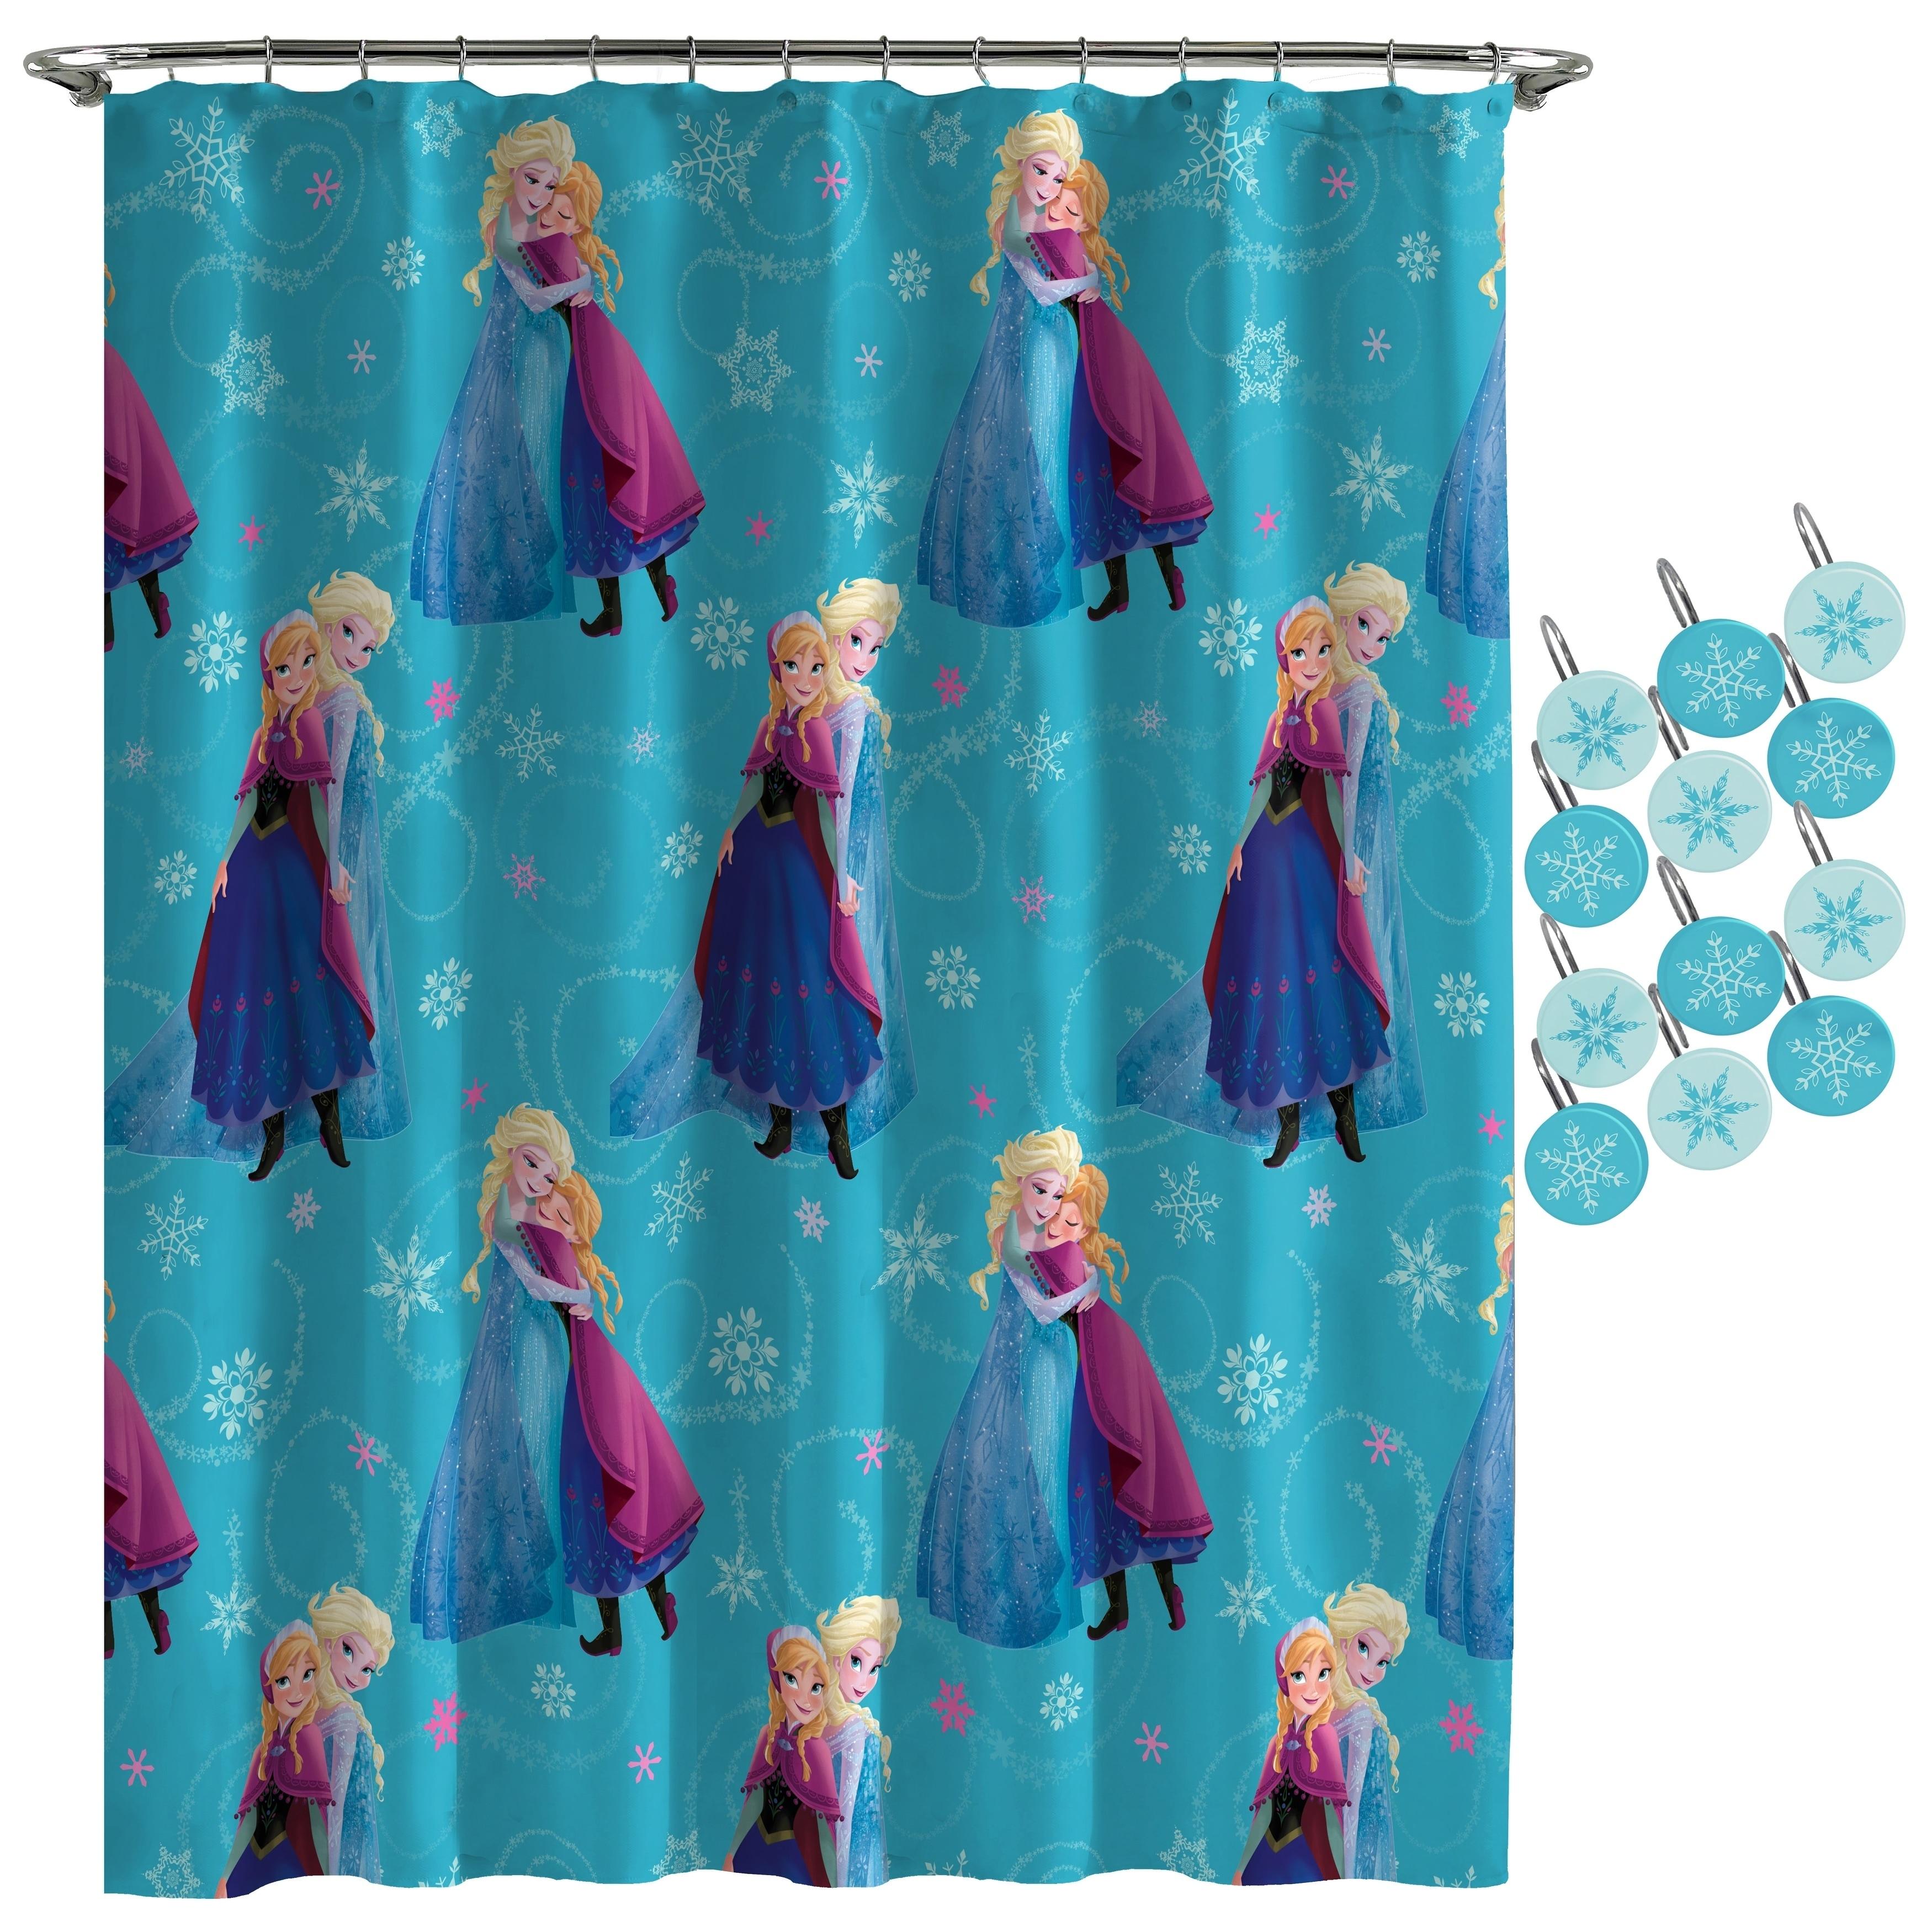 Shop Disney Frozen Swirl Shower Curtain And Hooks